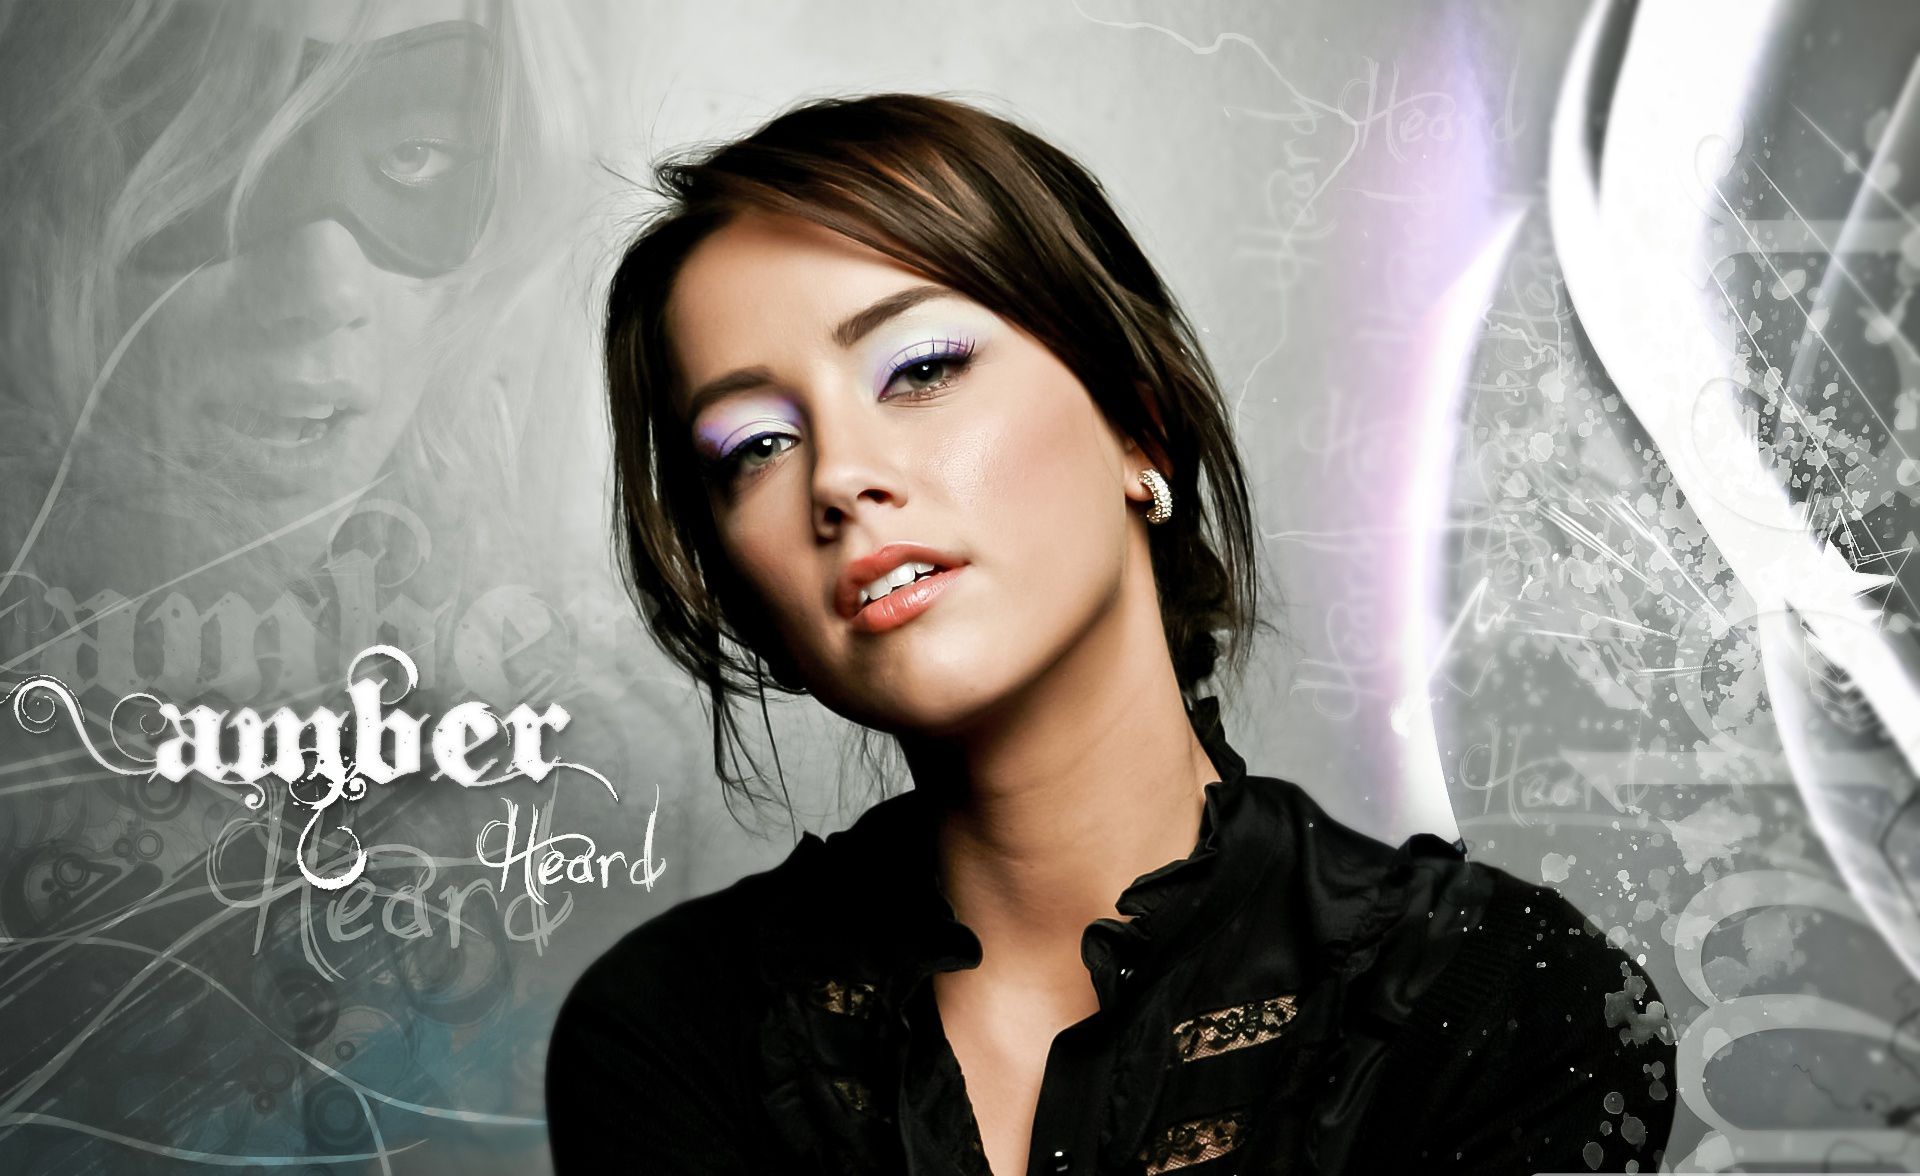 Amber Heard Hd: Amber Heard HD Wallpapers • PoPoPics.com